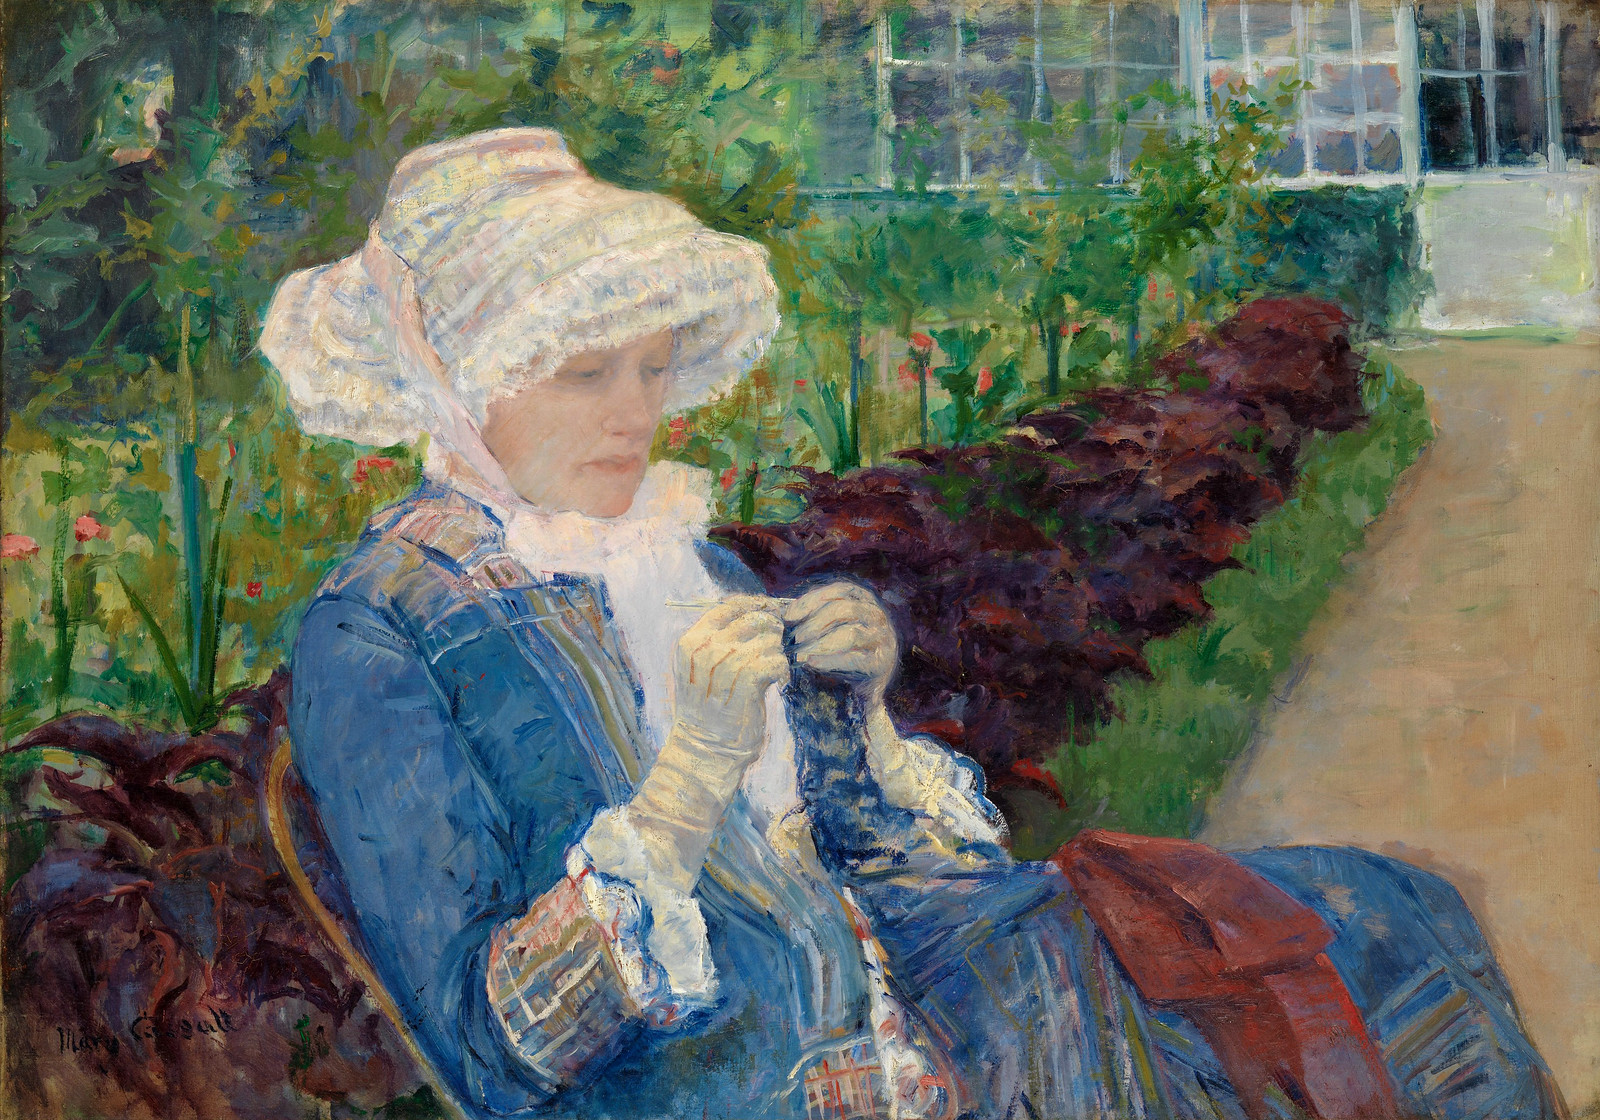 Картинки по запросу metropolitan museum of art public parks private gardens paris to provence